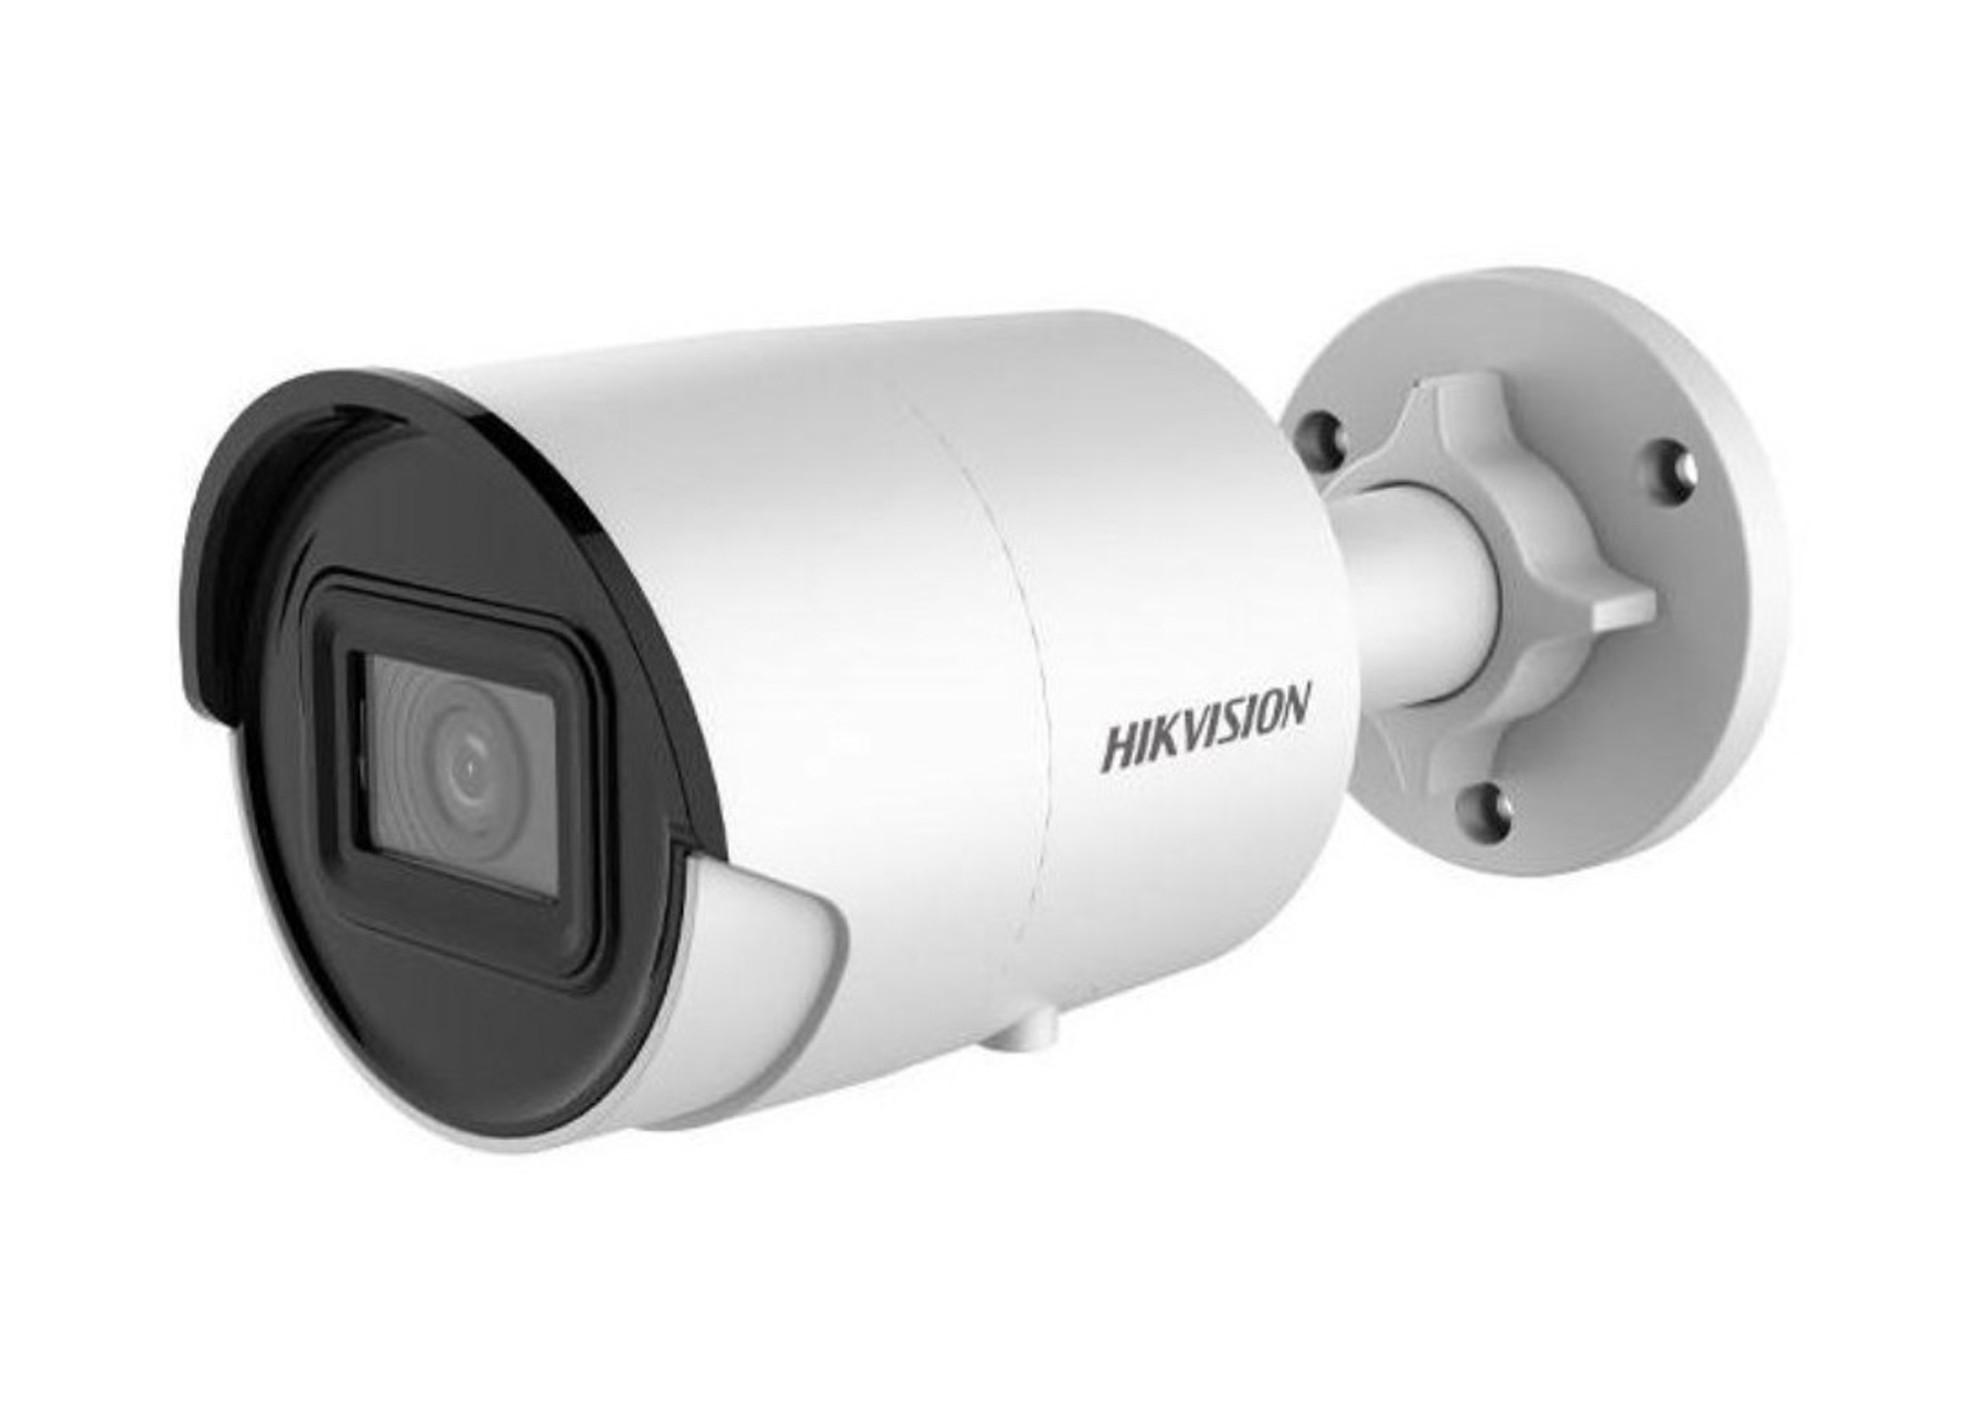 Kamera DS-2CD2046G2-IU(2.8mm) rč.001H